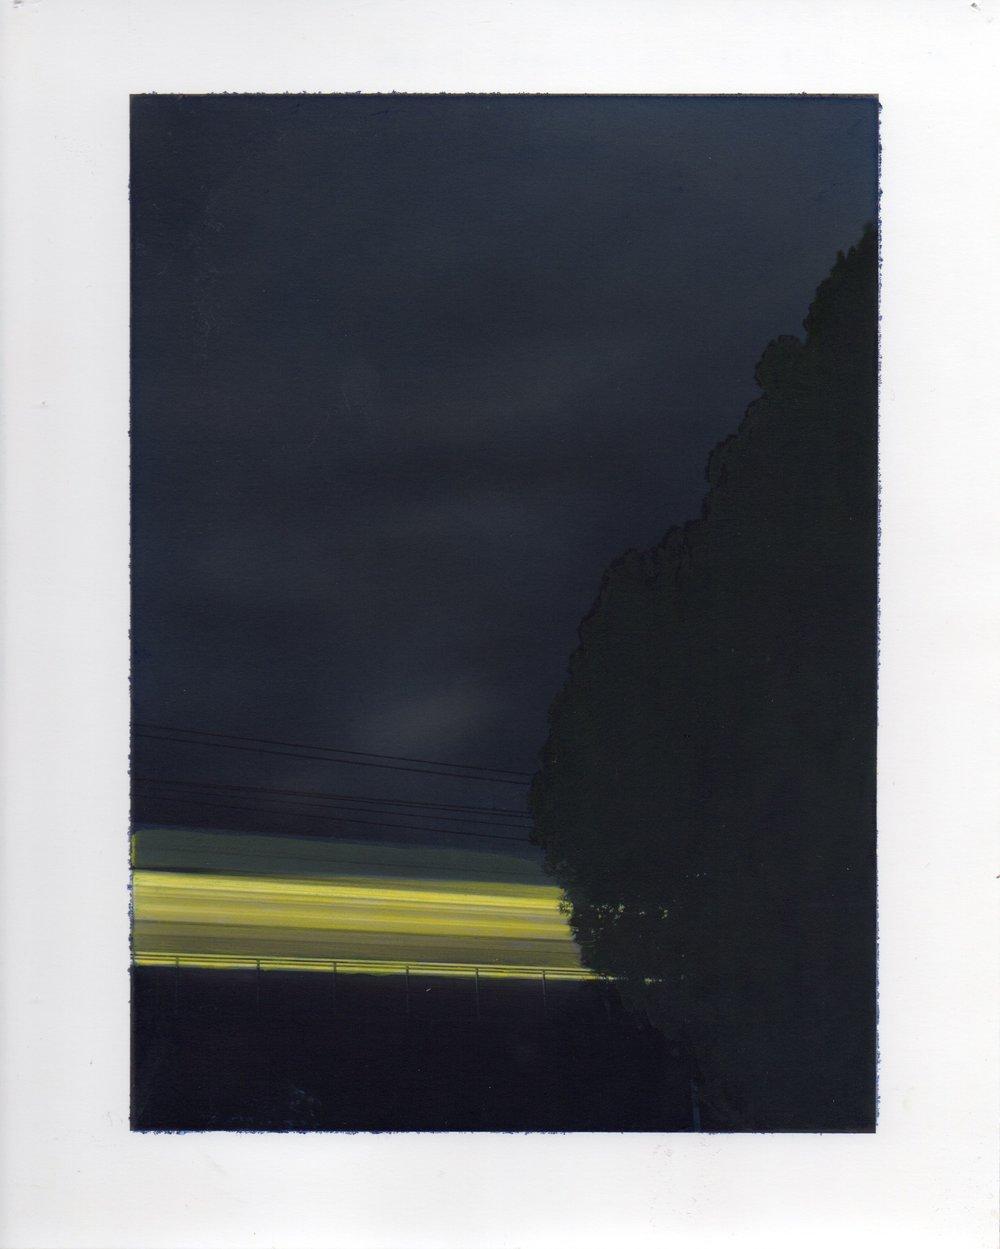 "3-16-12, P.M.  54"" X 42"" Oil on silver gelatin print 2013"